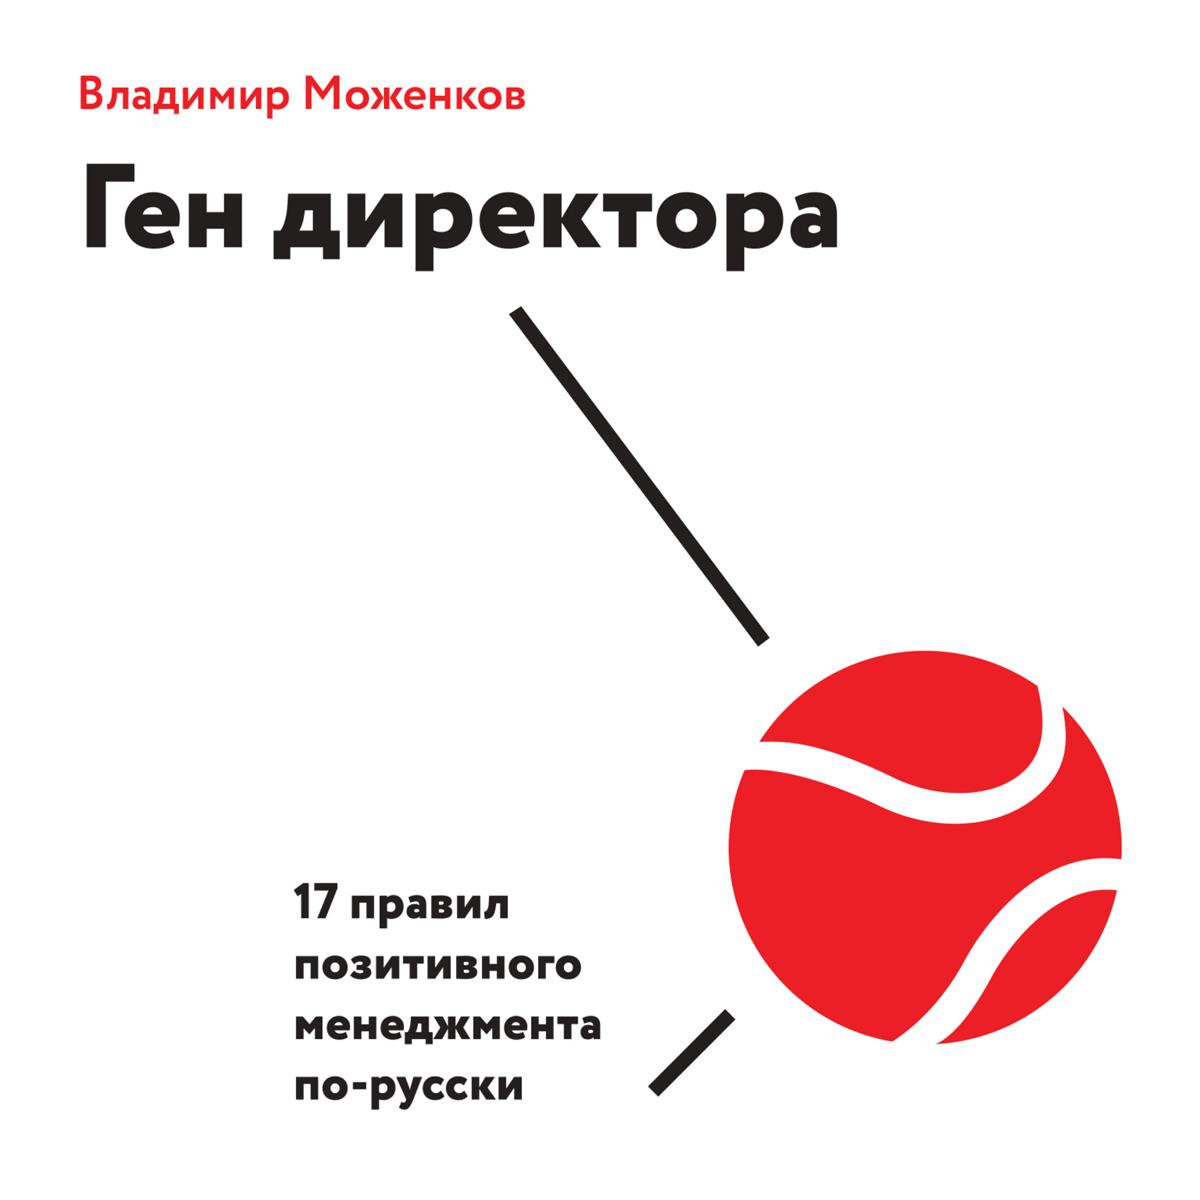 Владимир Моженков Ген директора. 17 правил позитивного менеджмента по-русски каталог ауди онлайн по вин коду